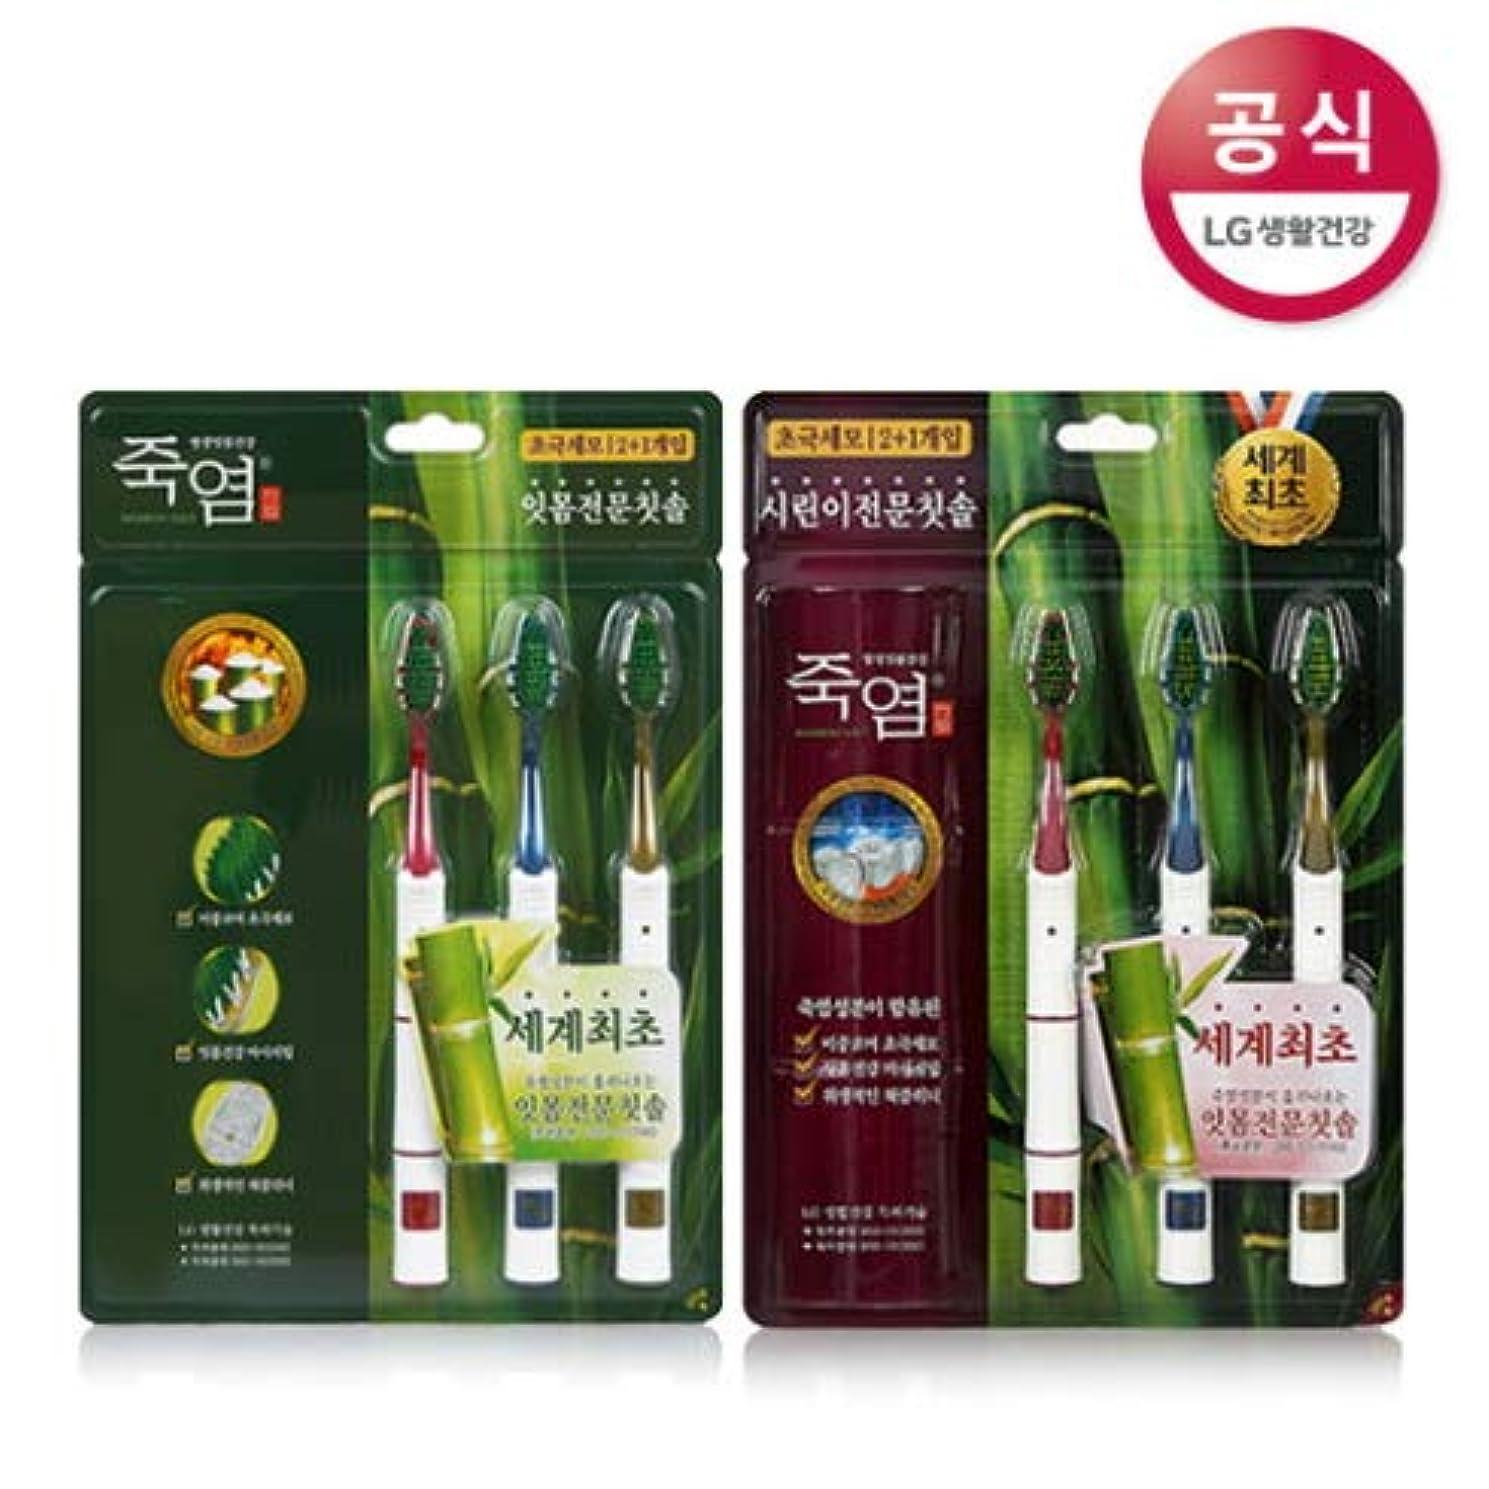 [LG HnB] Bamboo salt syringe/gum professional toothbrush/竹塩つぶれが/歯茎専門の歯ブラシ 3口x2個(海外直送品)